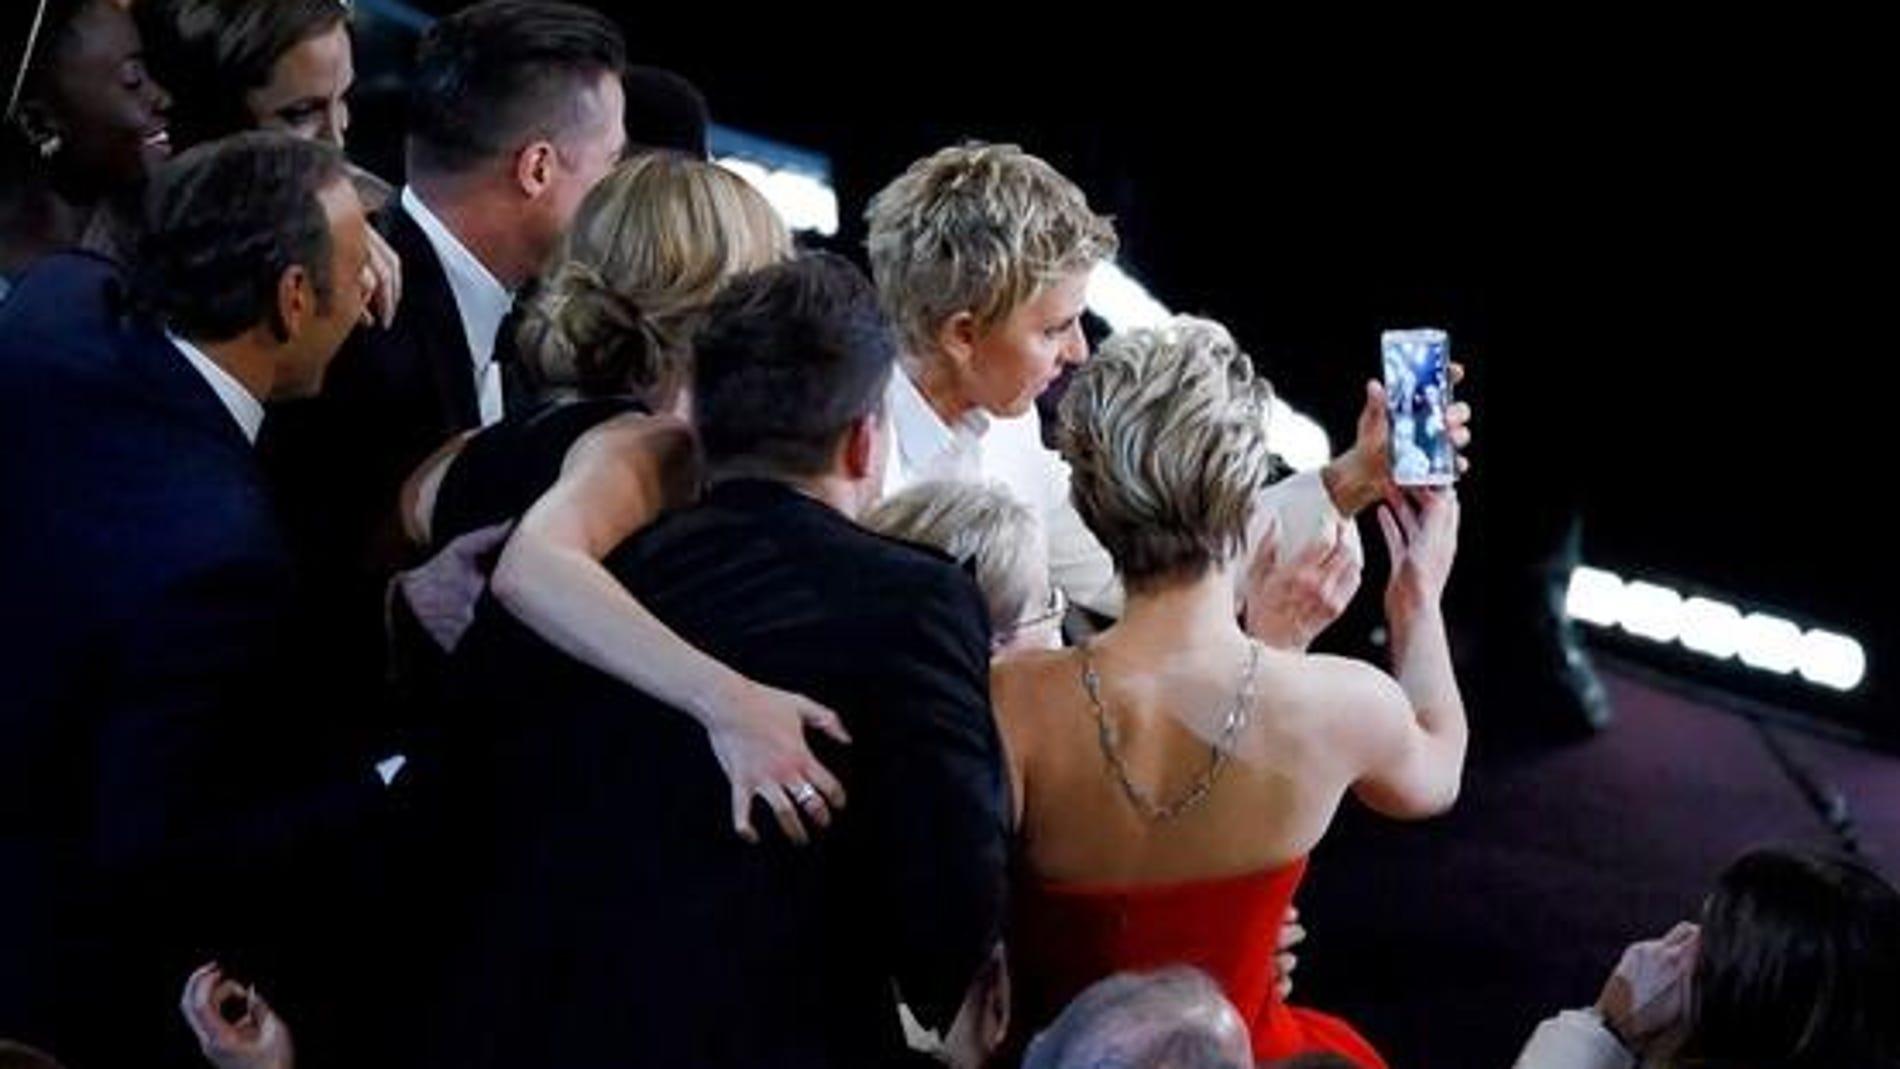 Momento antes del selfie